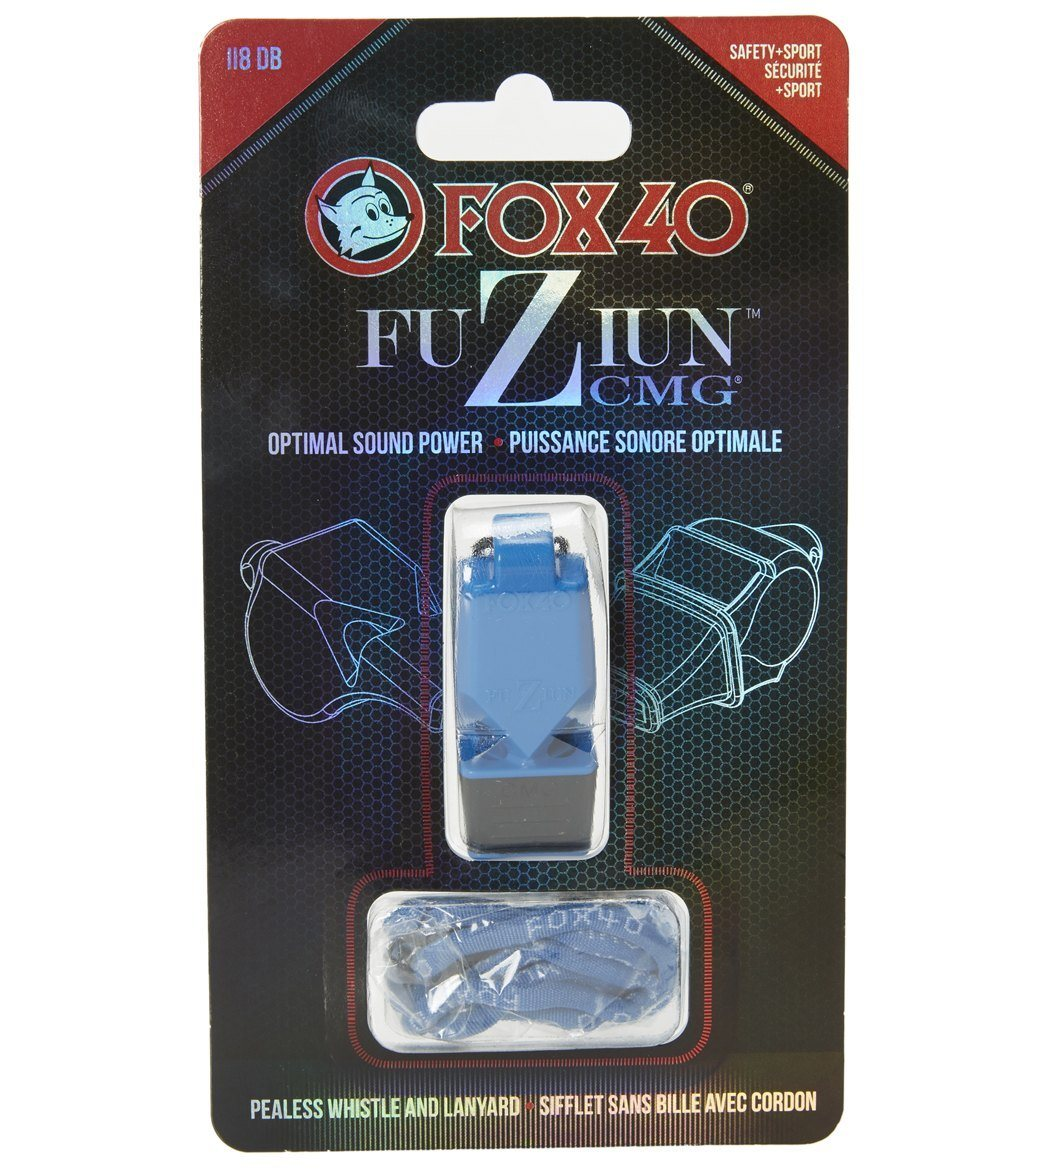 a820df0f3f5b Fox 40 Fuziun CMG Lifeguard Whistle w  Lanyard at SwimOutlet.com